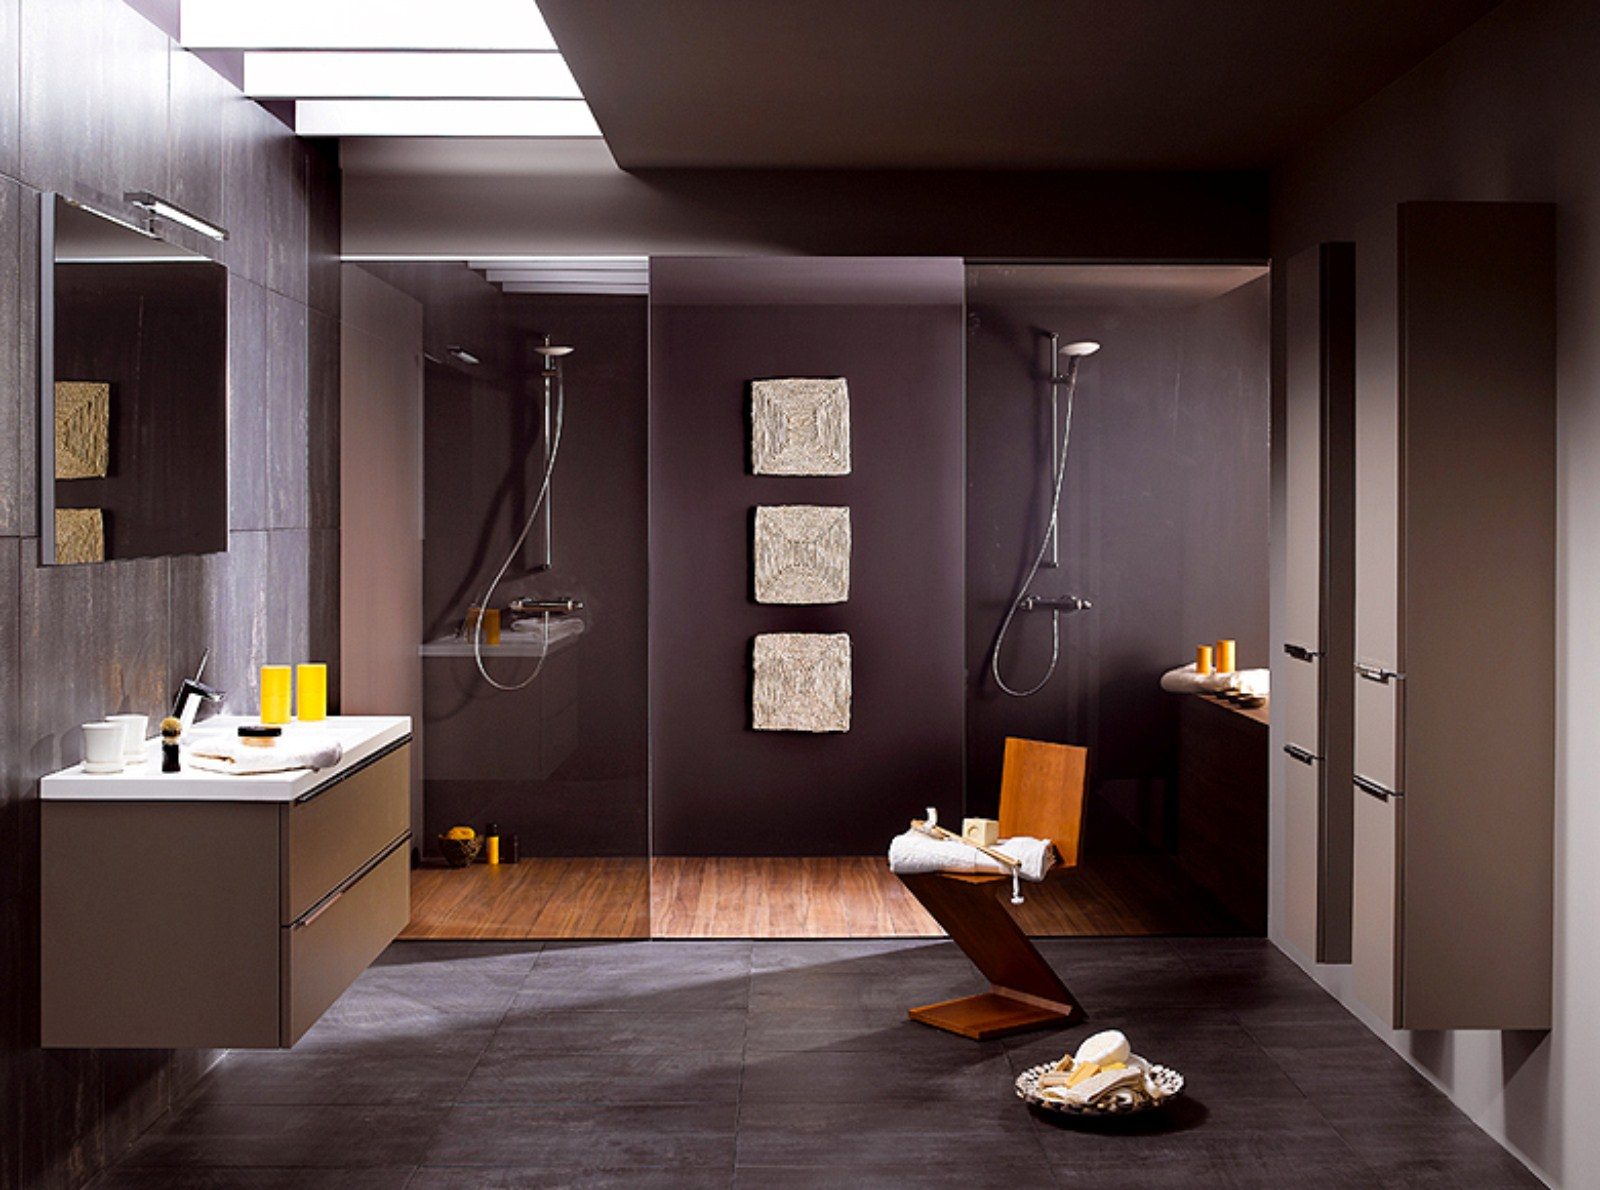 Bathroom desing